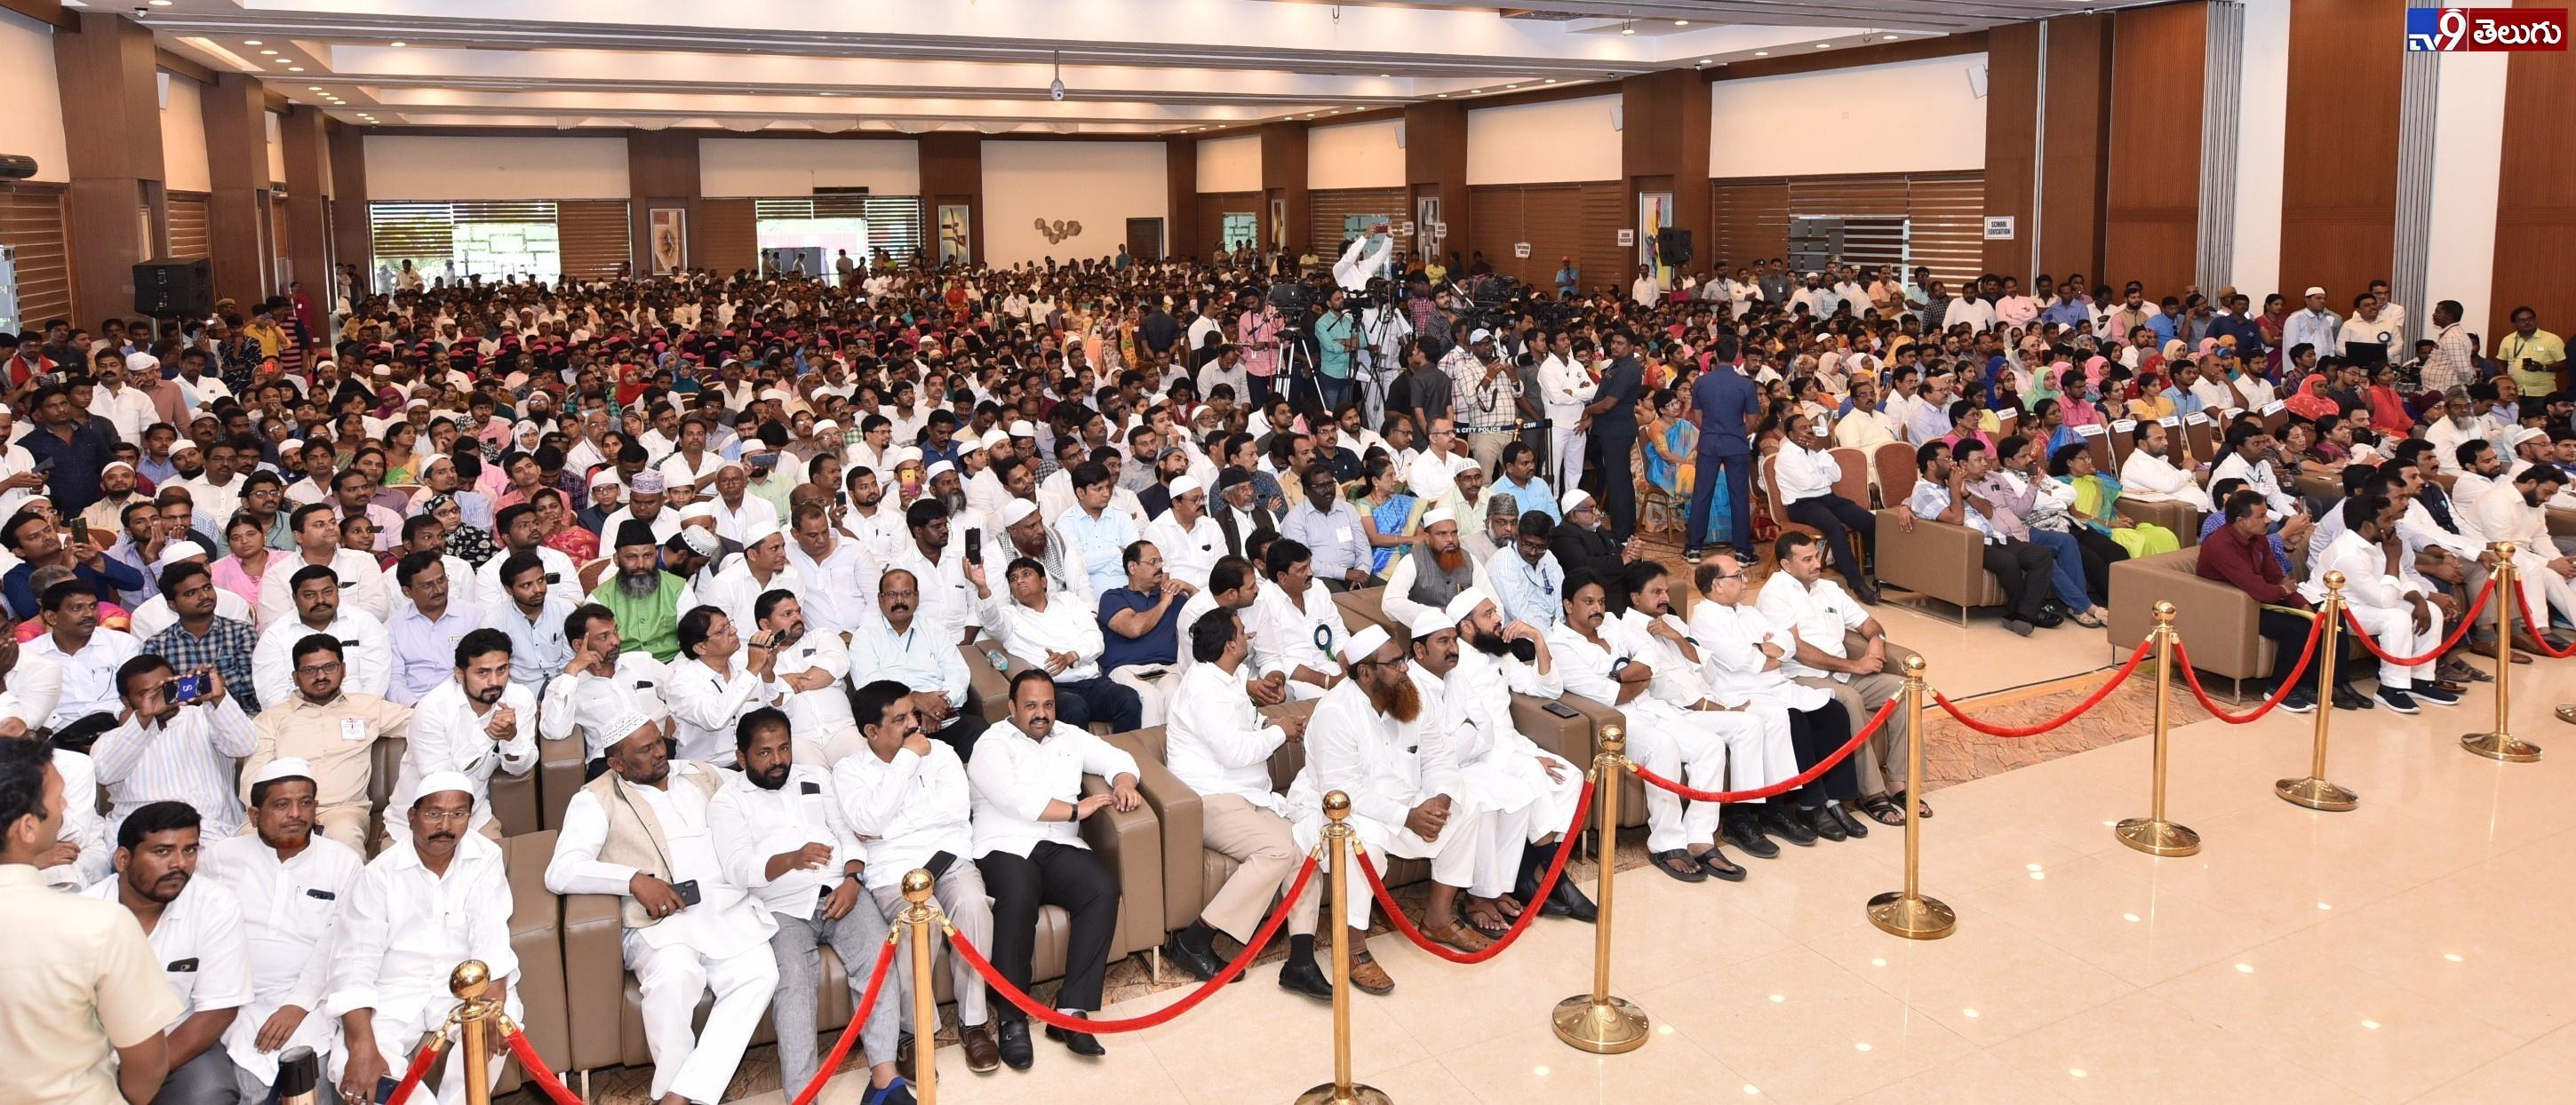 AP CM jagan Mohan Reddy, జాతీయ విద్య, మైనారిటీల సంక్షేమ దినోత్సవంలో పాల్గొన్న వైఎస్ జగన్.